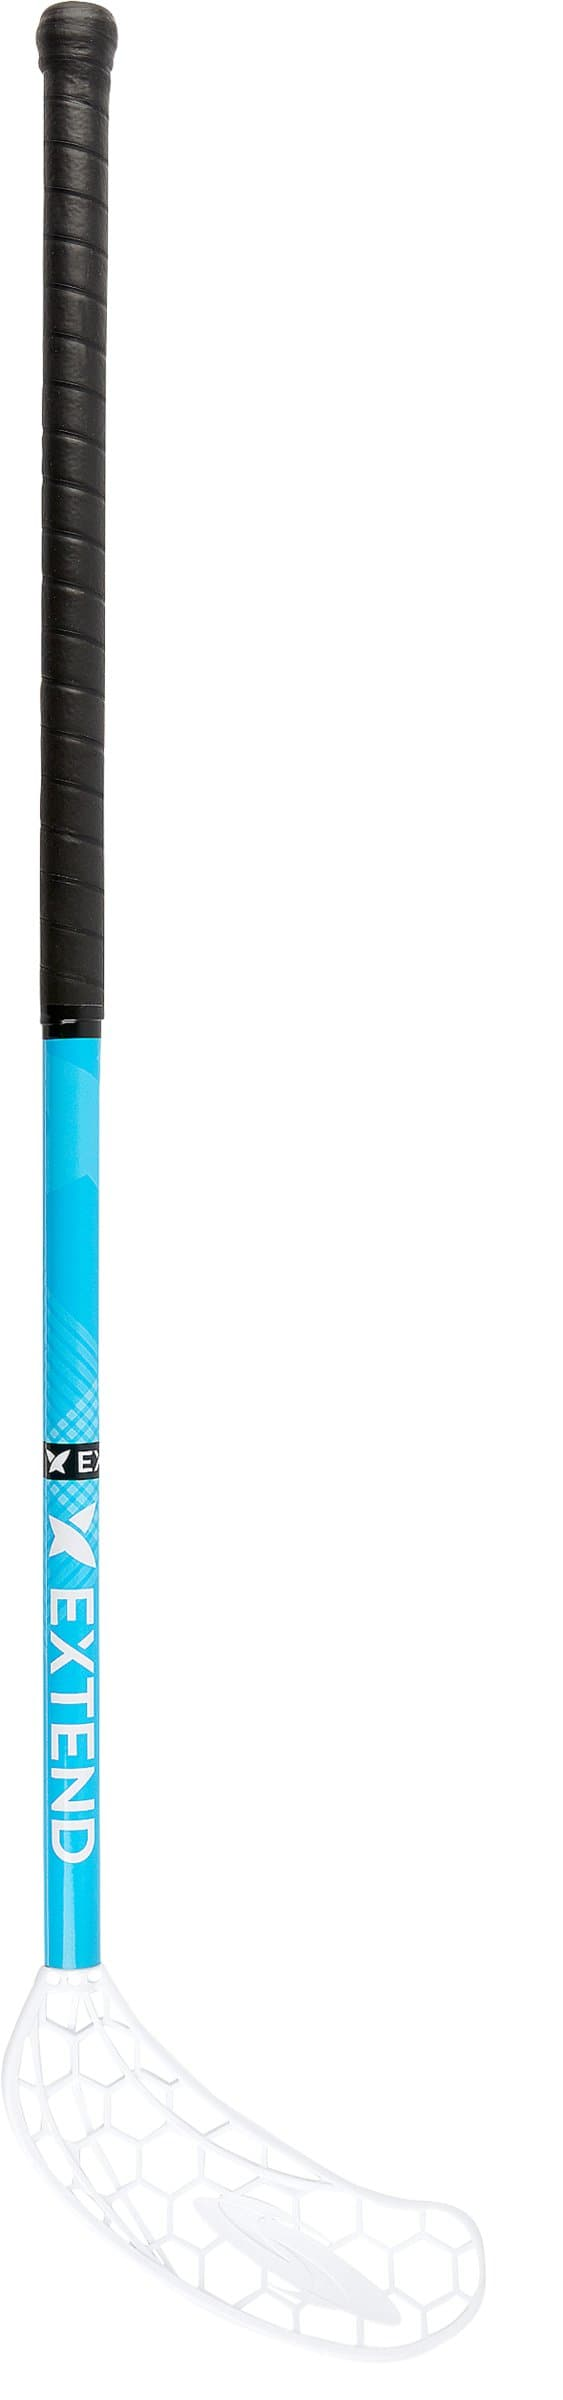 Extend Junior 85 cm inkl. Blade Canne junior 85 cm